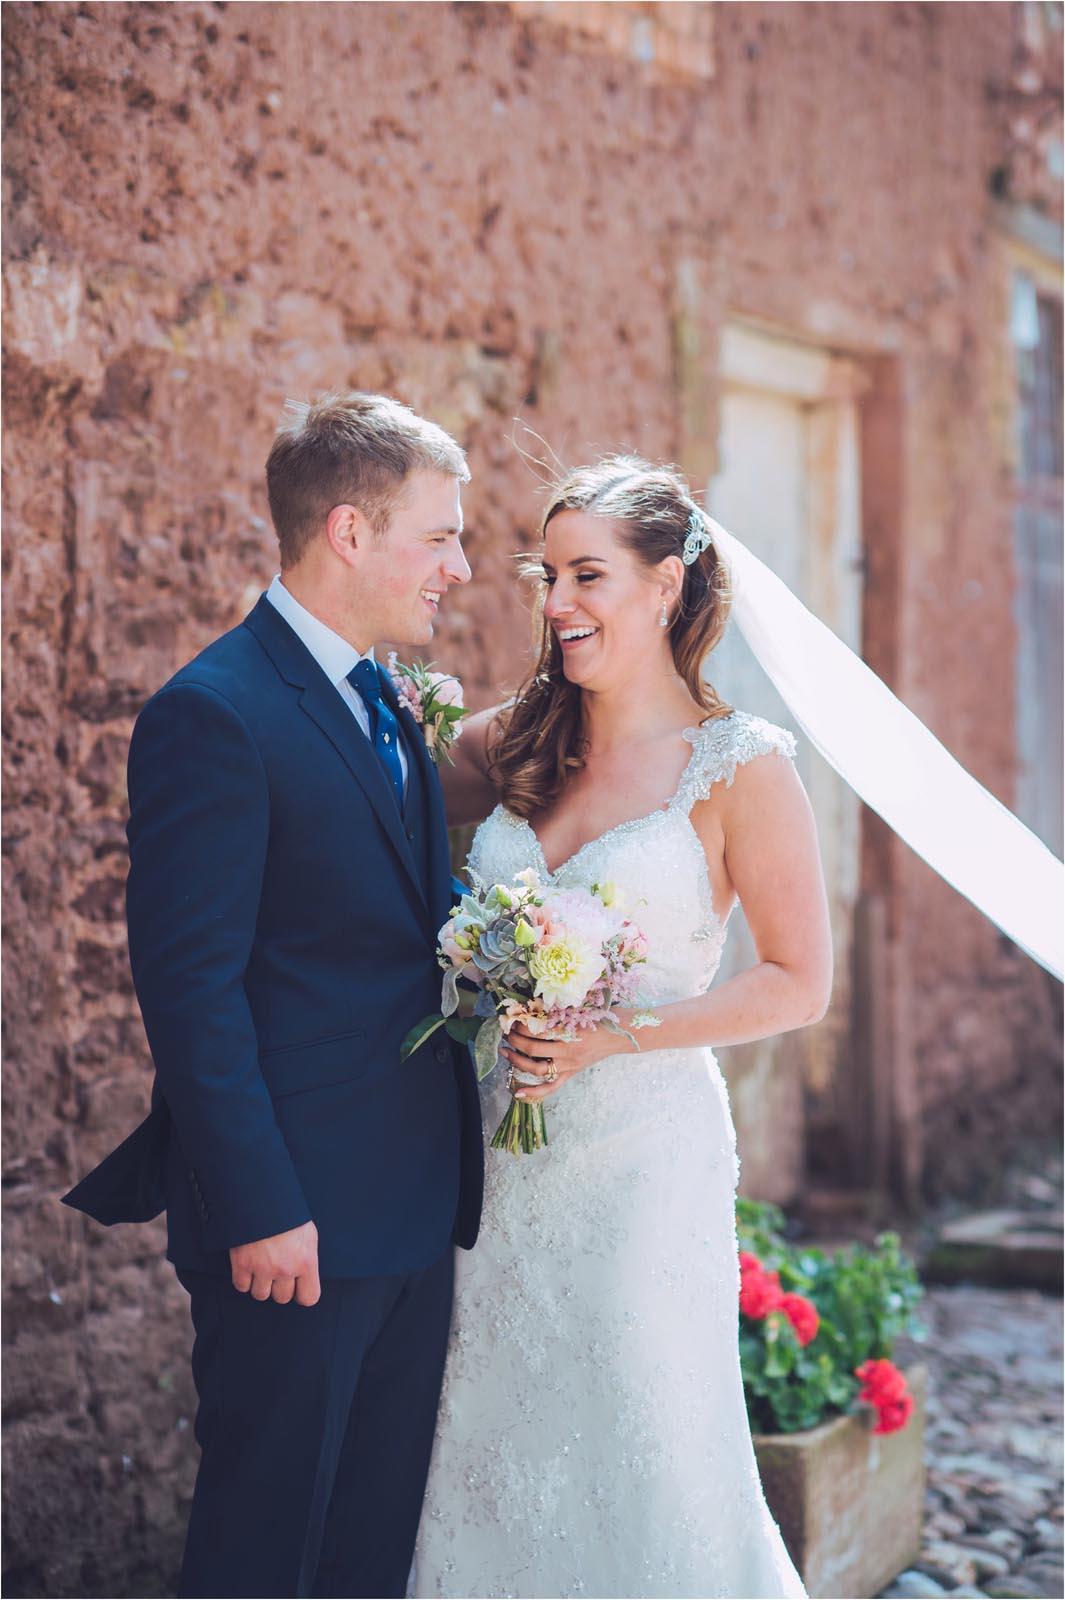 Simon biffen wedding photography 0087